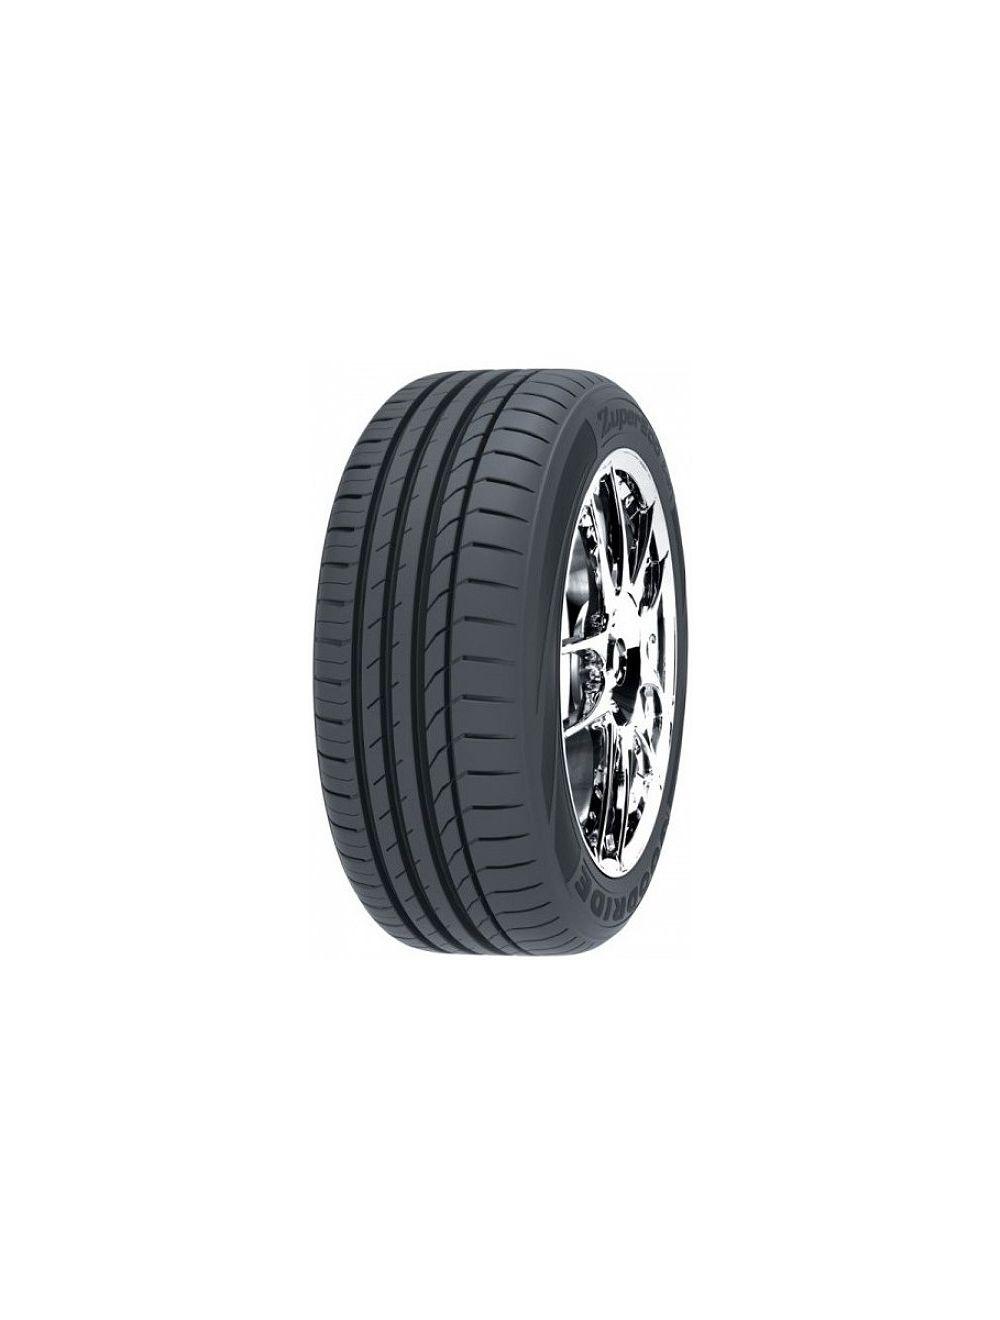 Goodride 215/65R16 V Z107 Nyári gumi